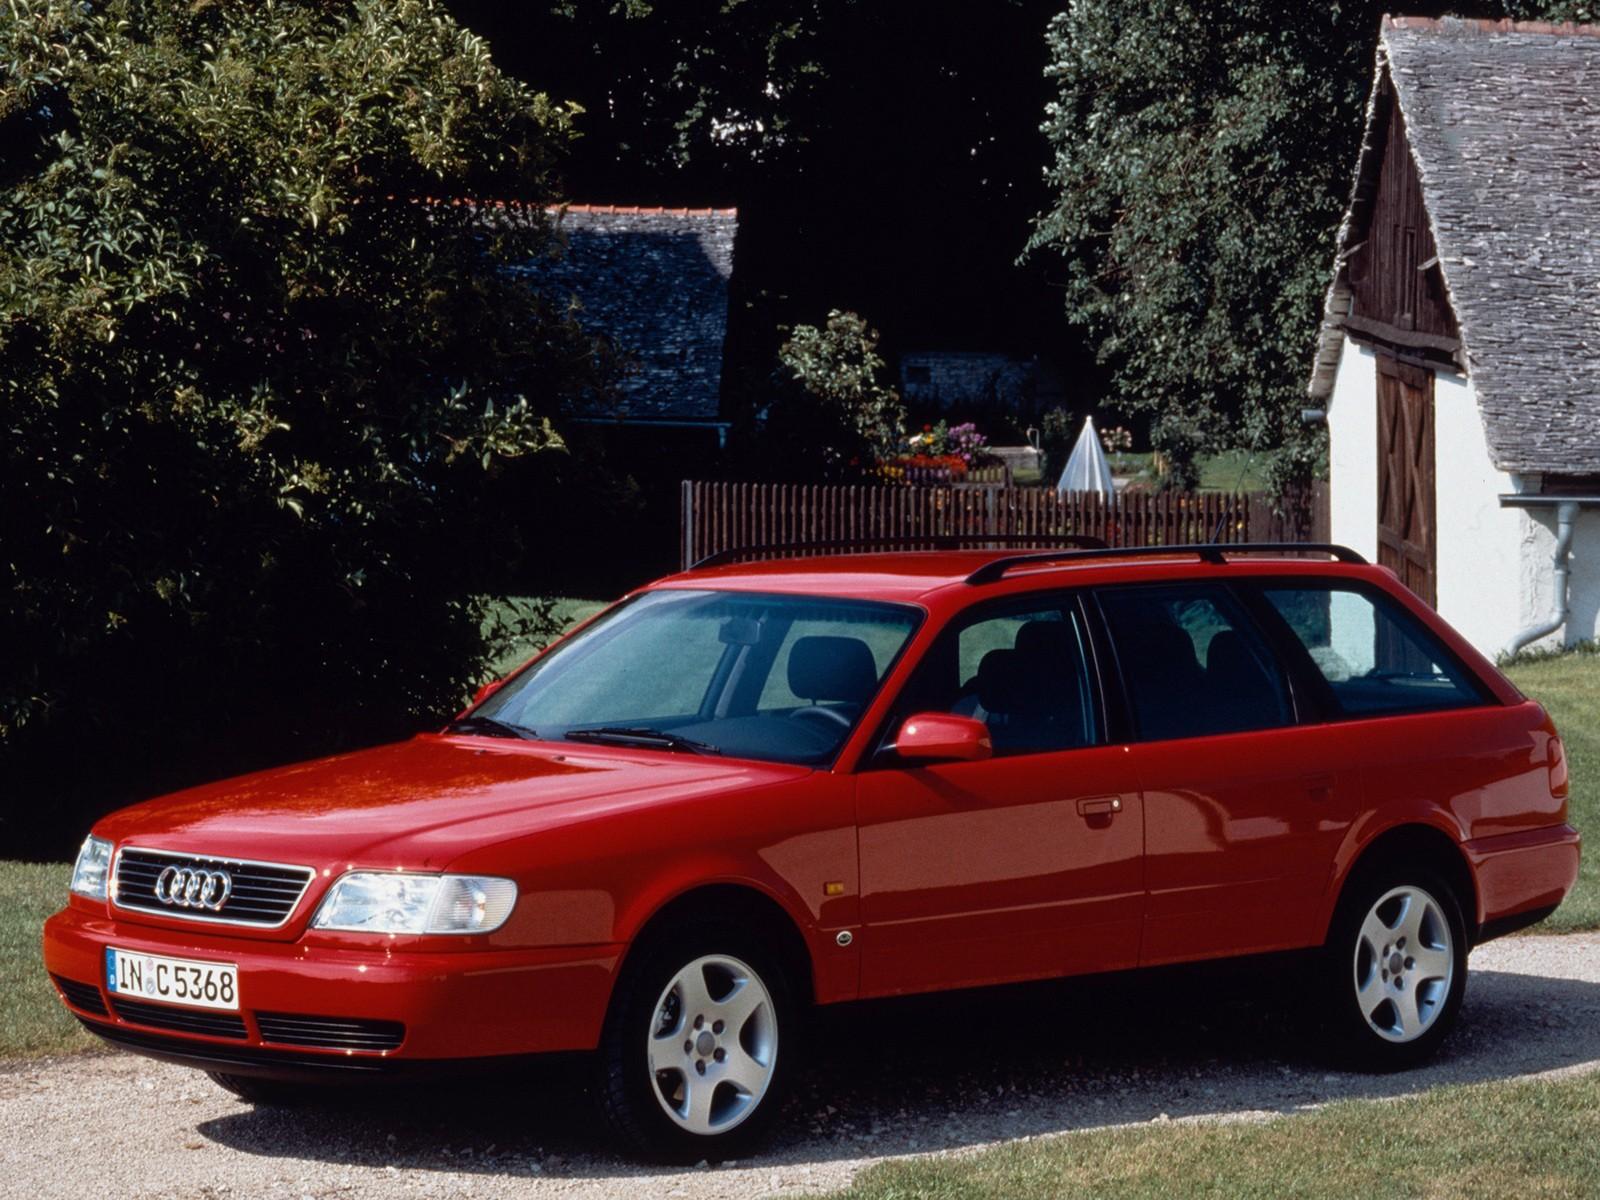 Audi S6 I (C4) 1994 - 1997 Sedan #3